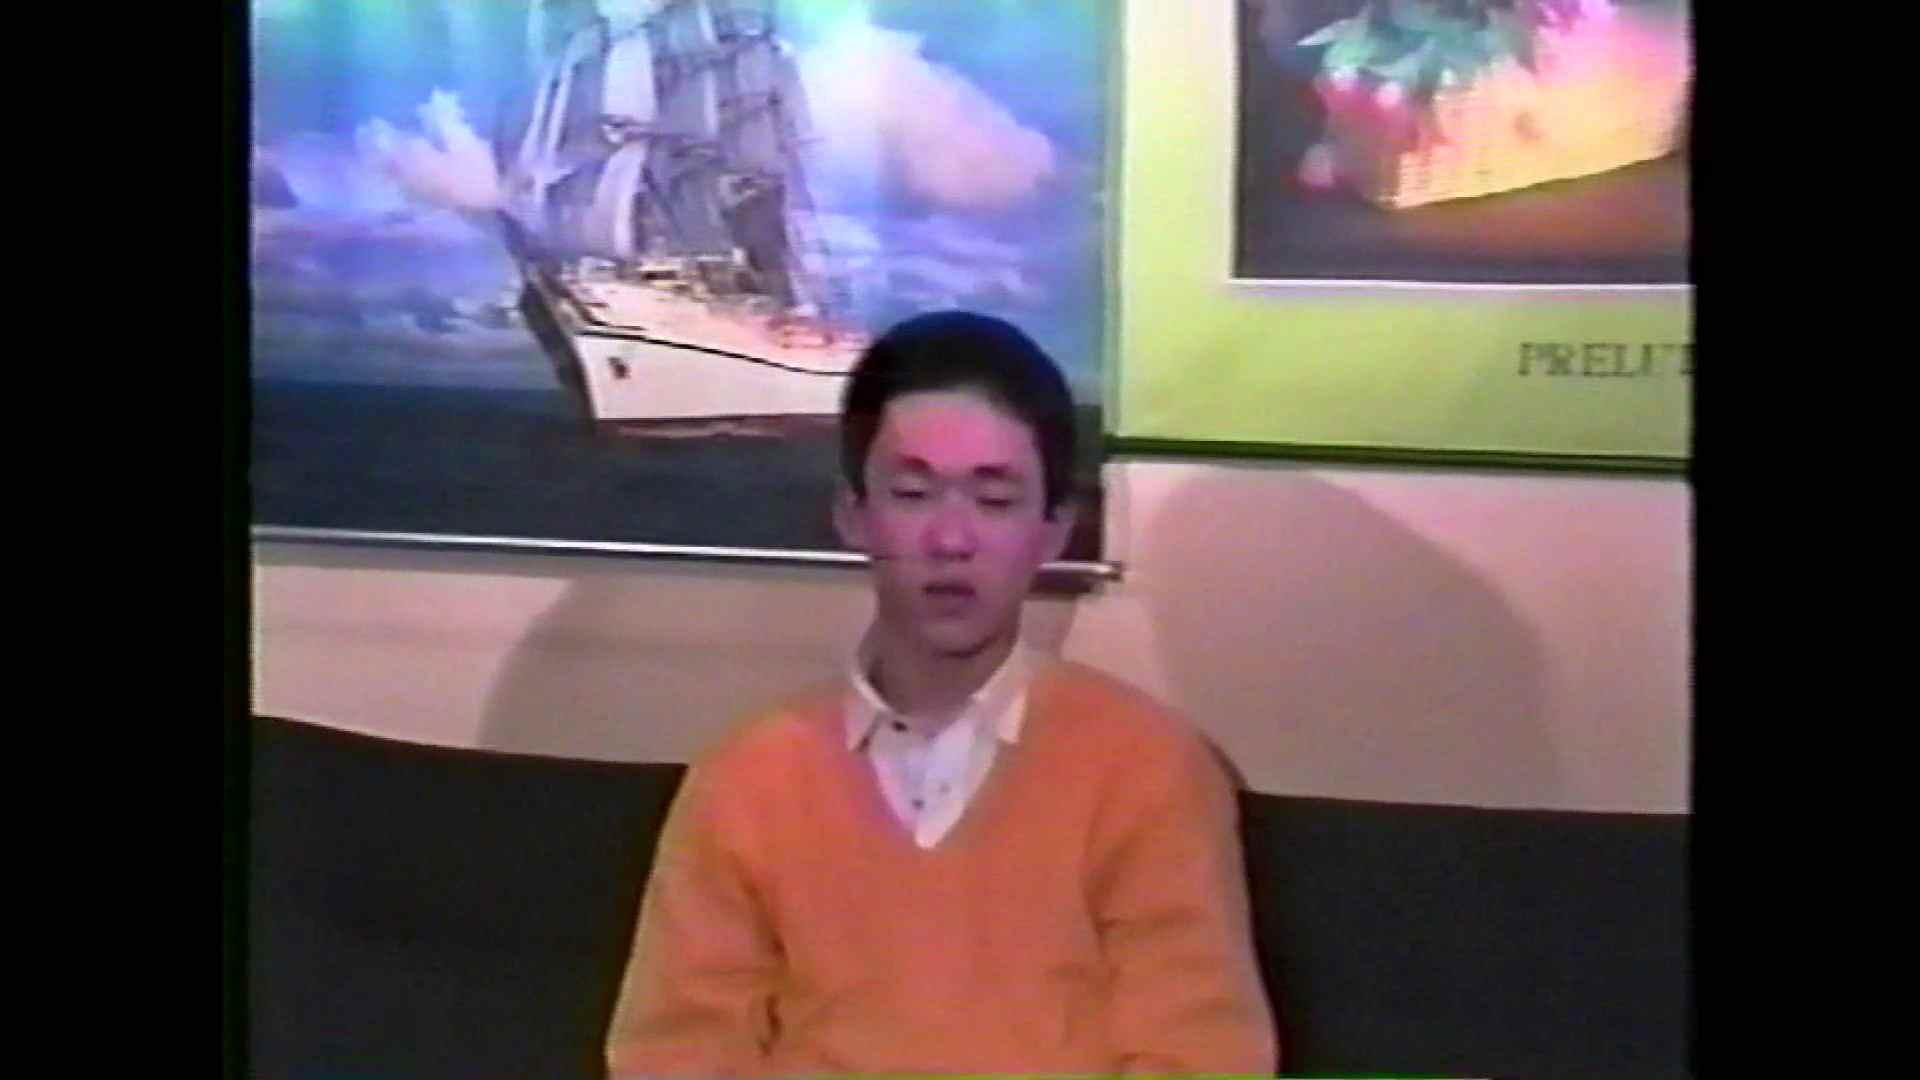 GAYBOY宏のオカズ倉庫Vol.2-1 完全無修正 | いやらしいノンケ  11枚 1